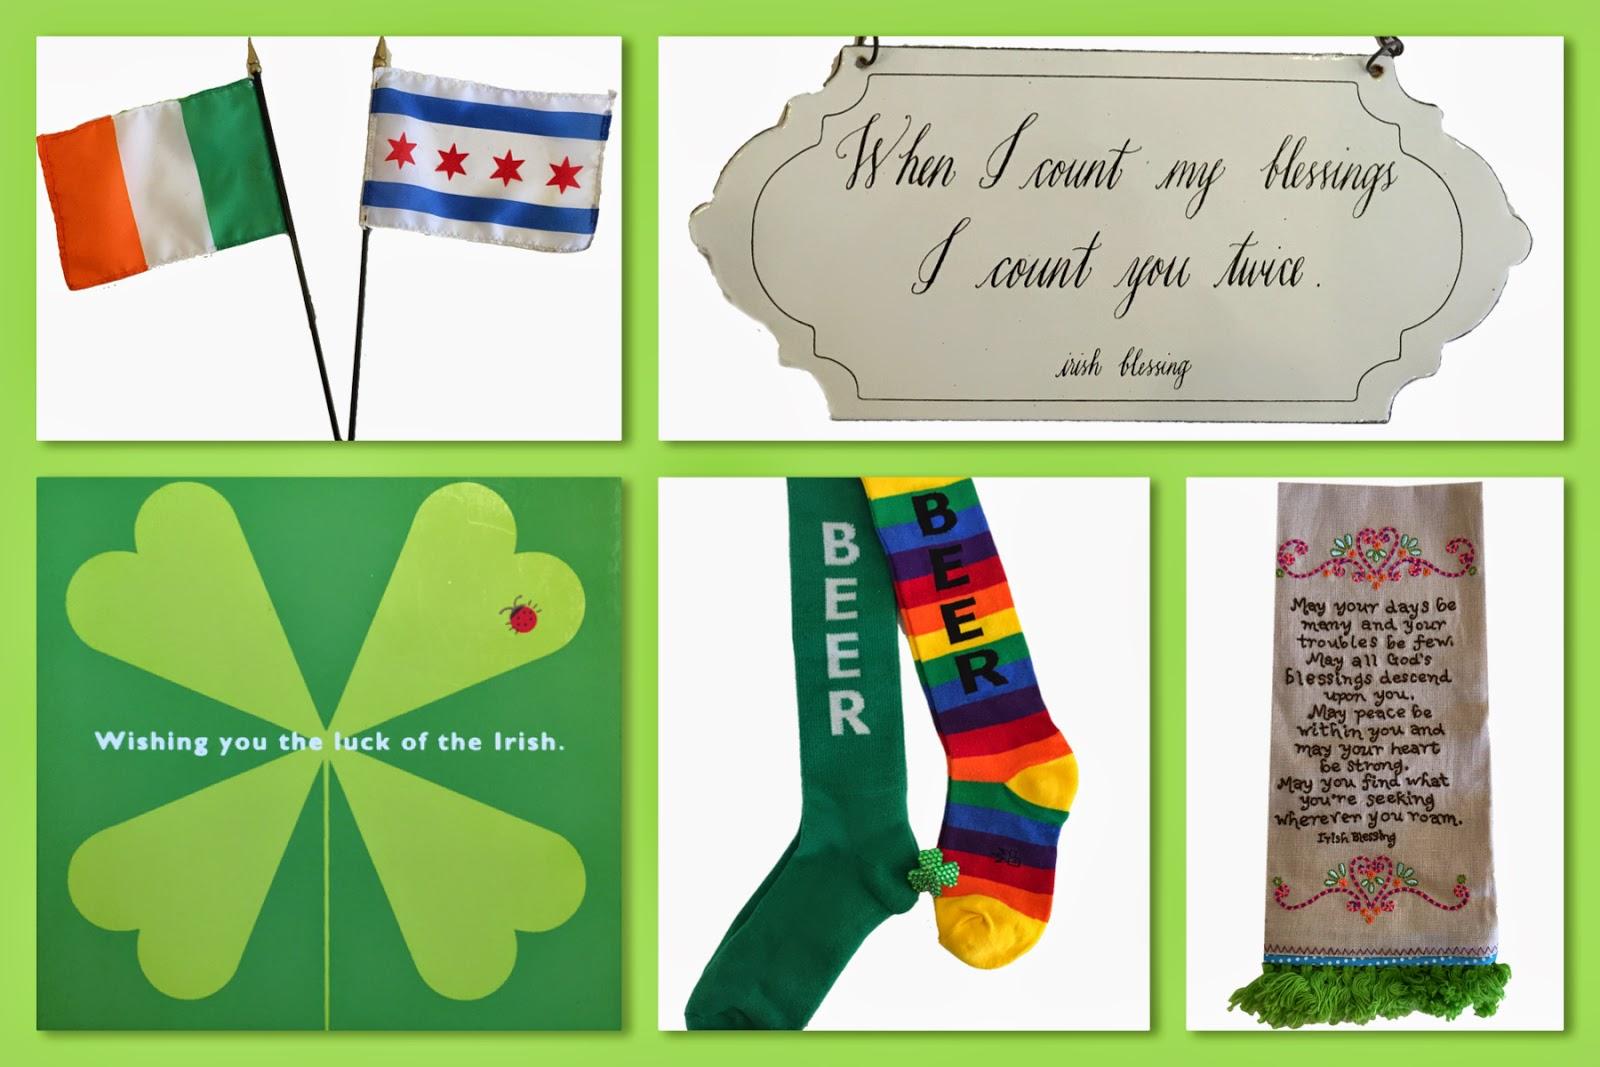 Wishing you the luck of the Irish